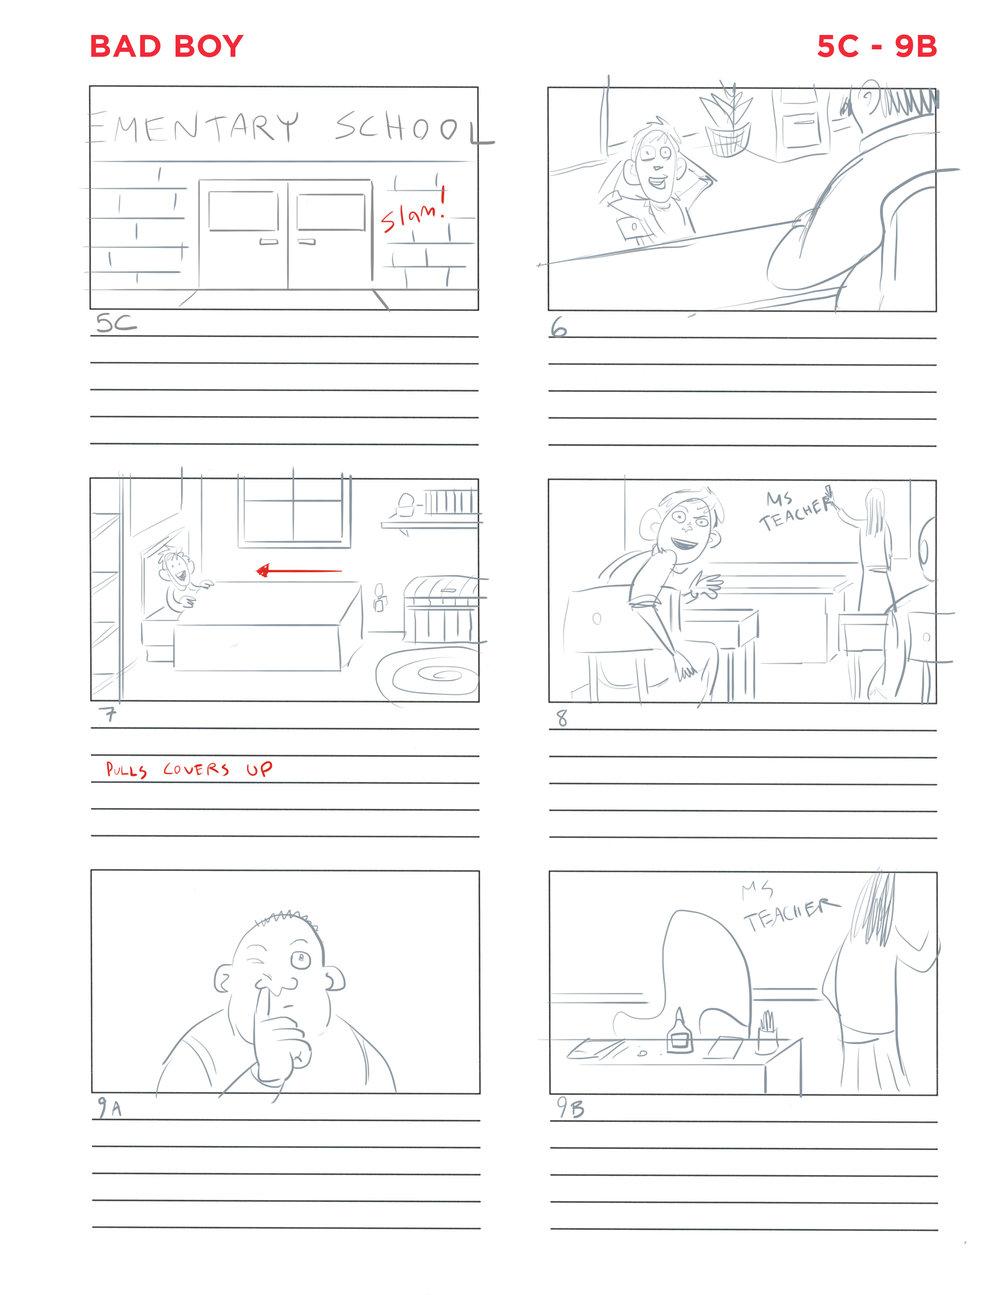 BadBoy-Storyboard-B.jpg